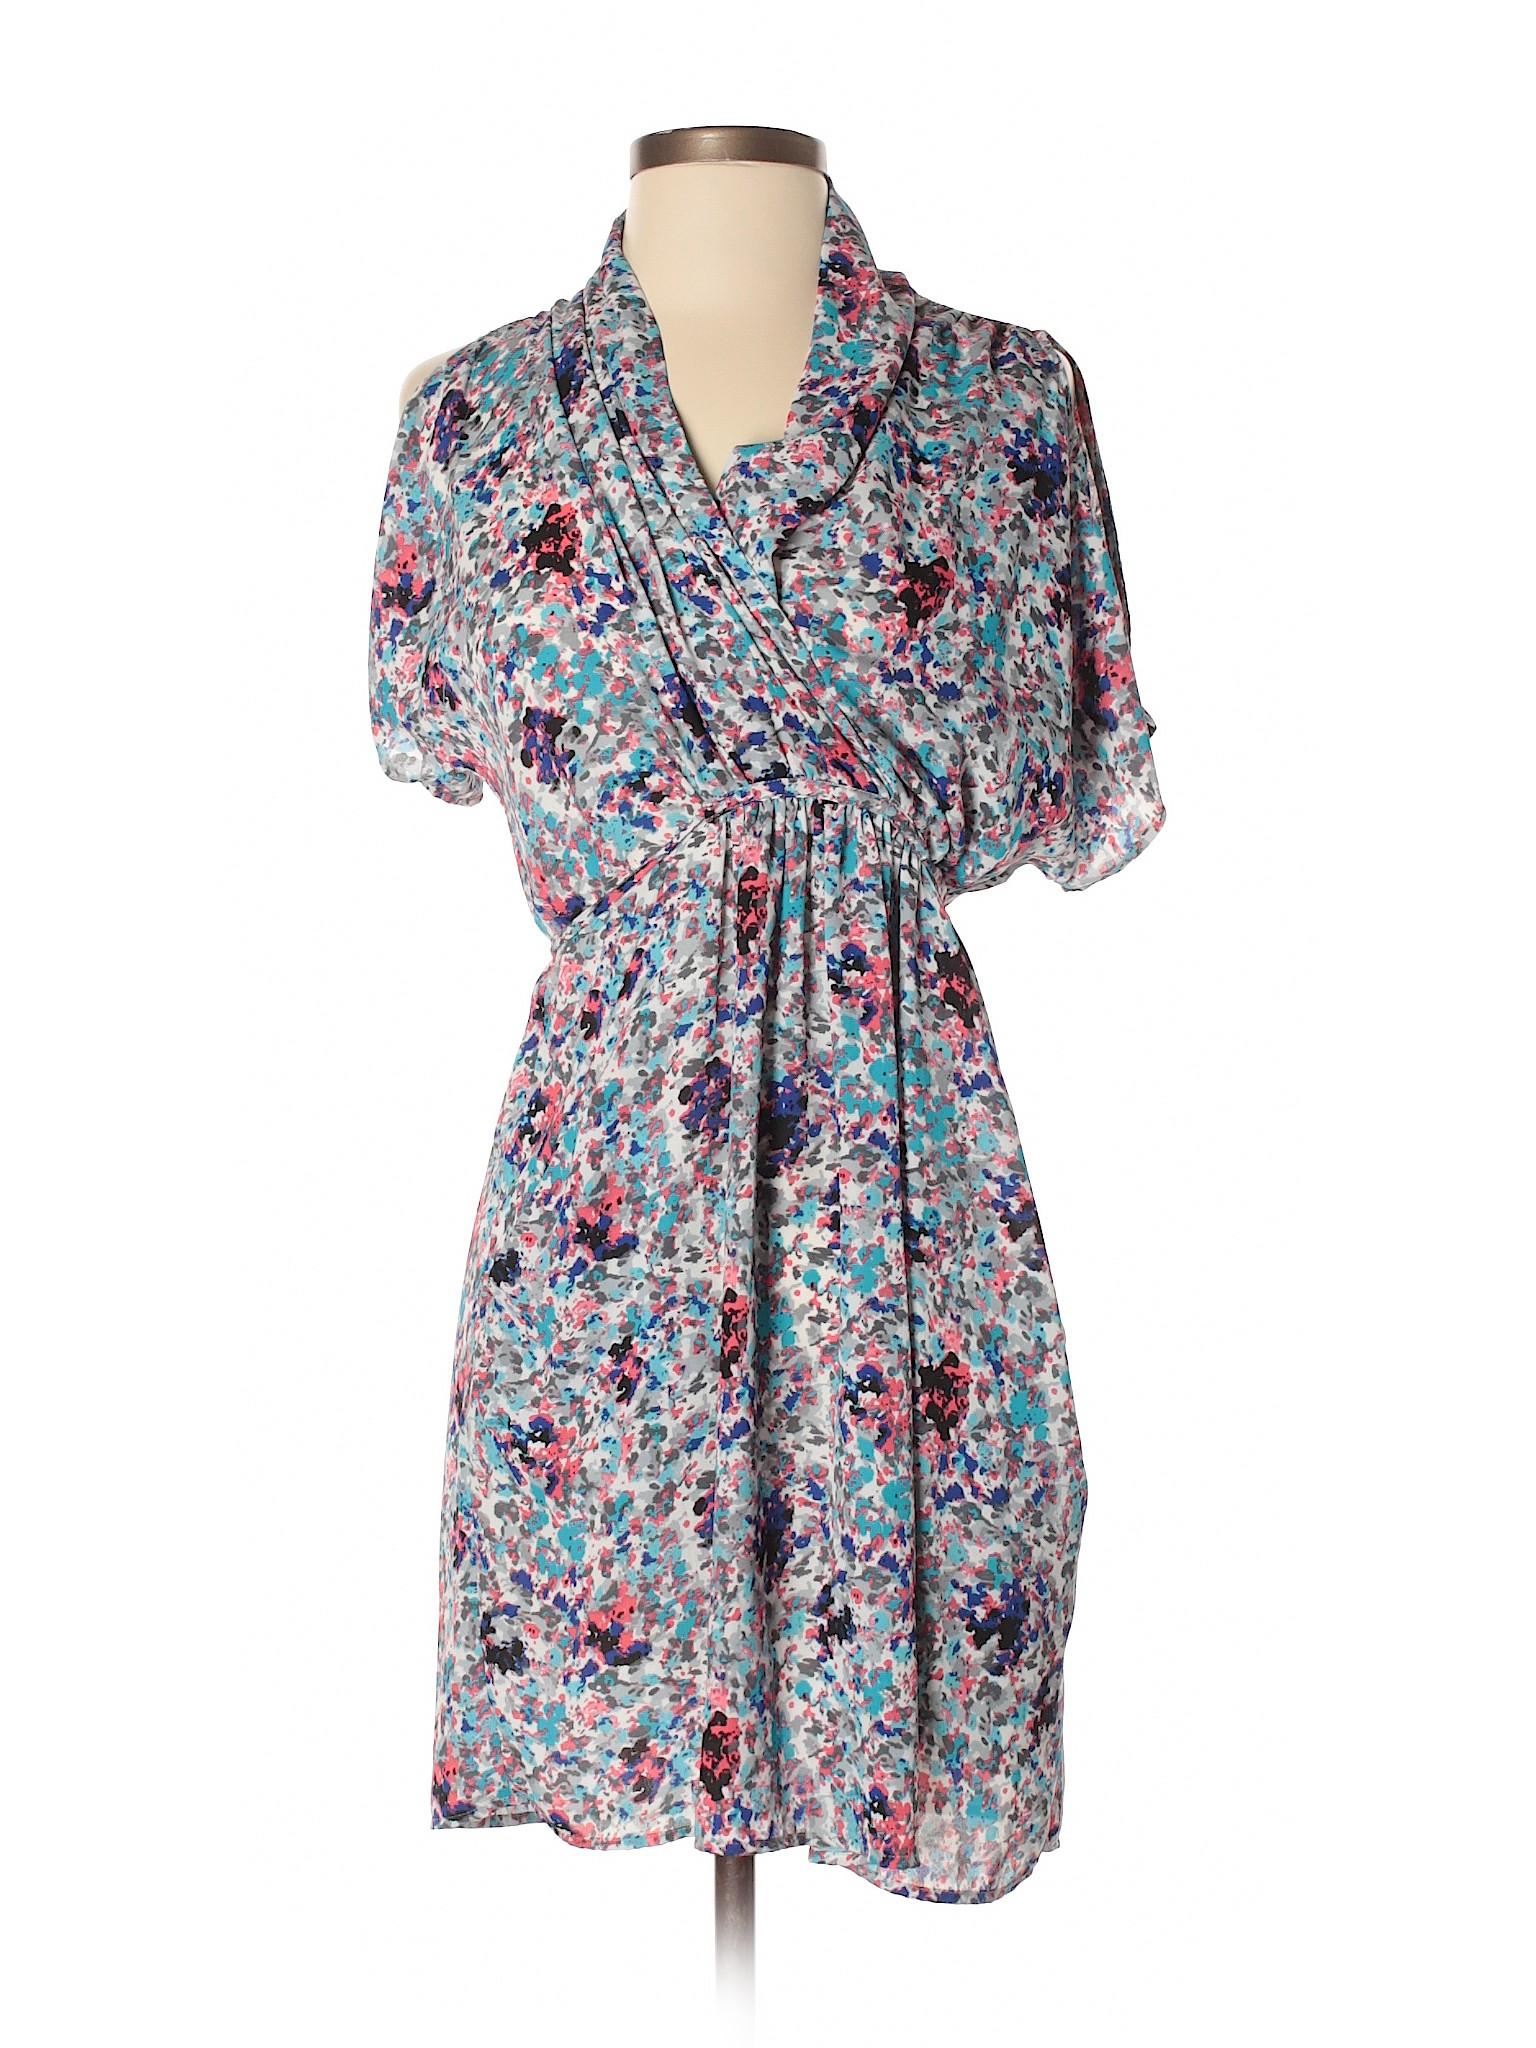 Dress Casual Selling Selling Aqua Aqua wTqzPO47